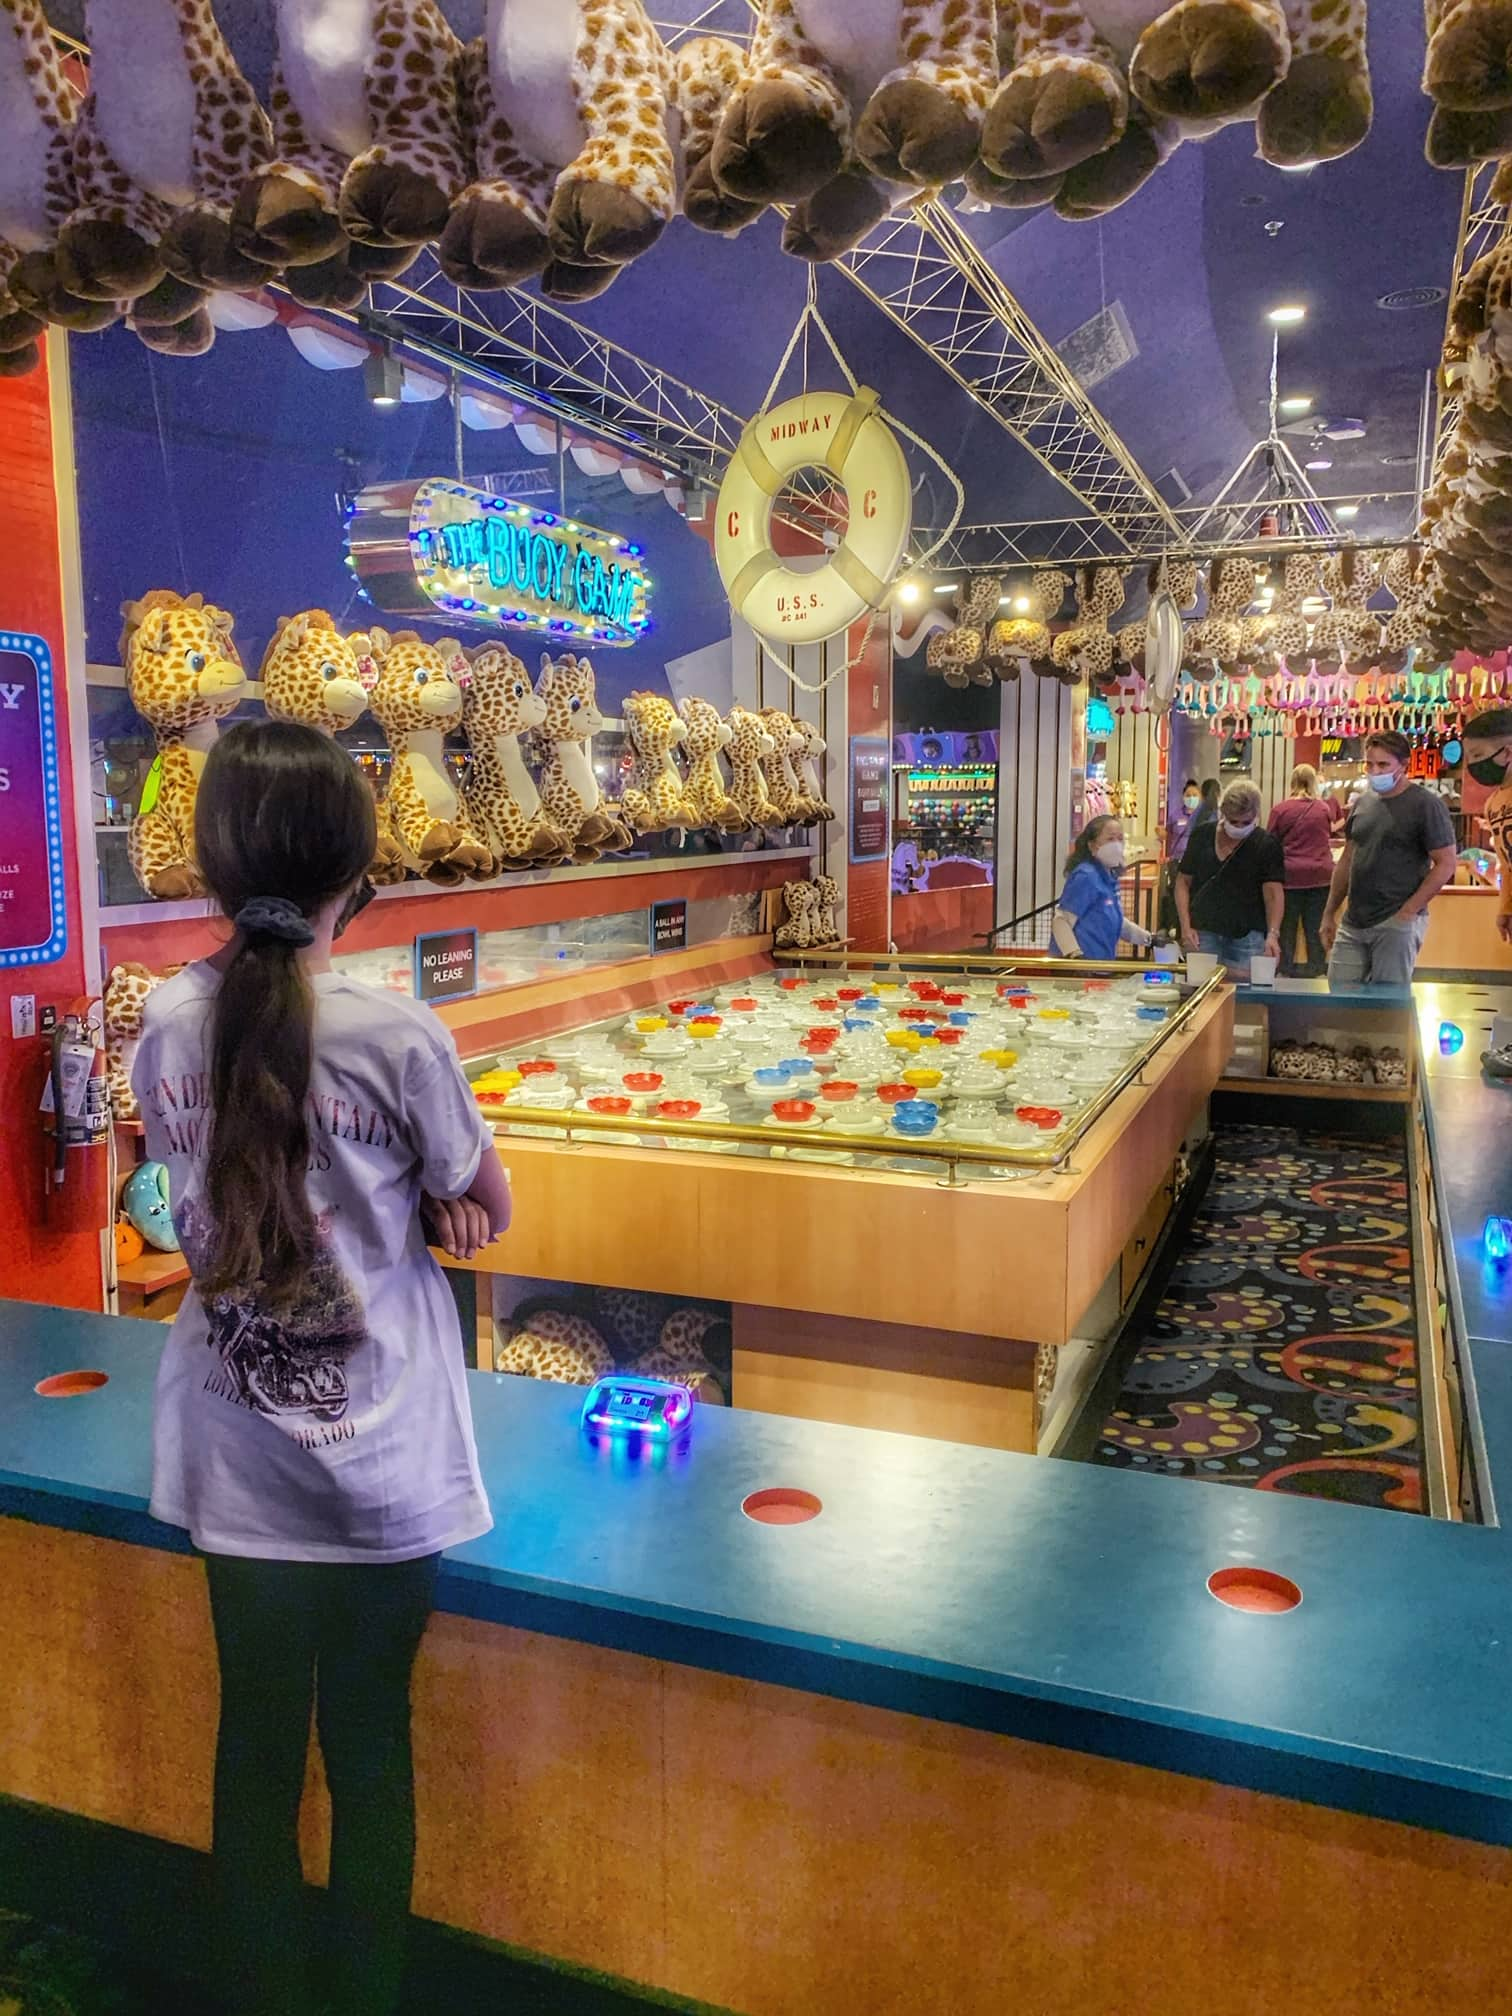 Circus Circus arcade and carnival games las vegas